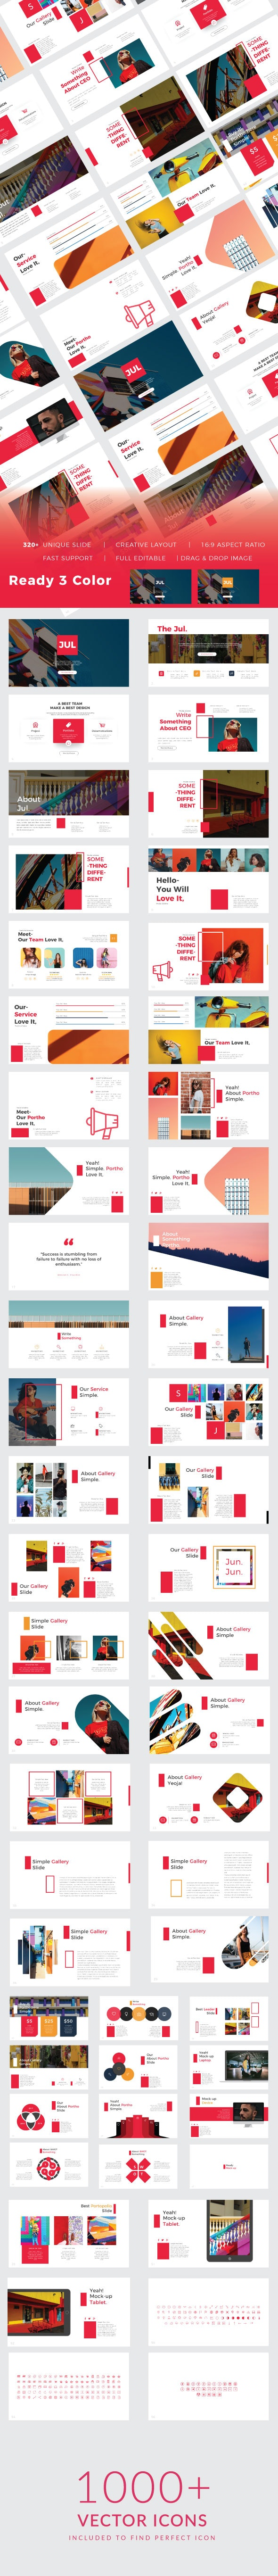 Jul. Creative Google Slide - Google Slides Presentation Templates